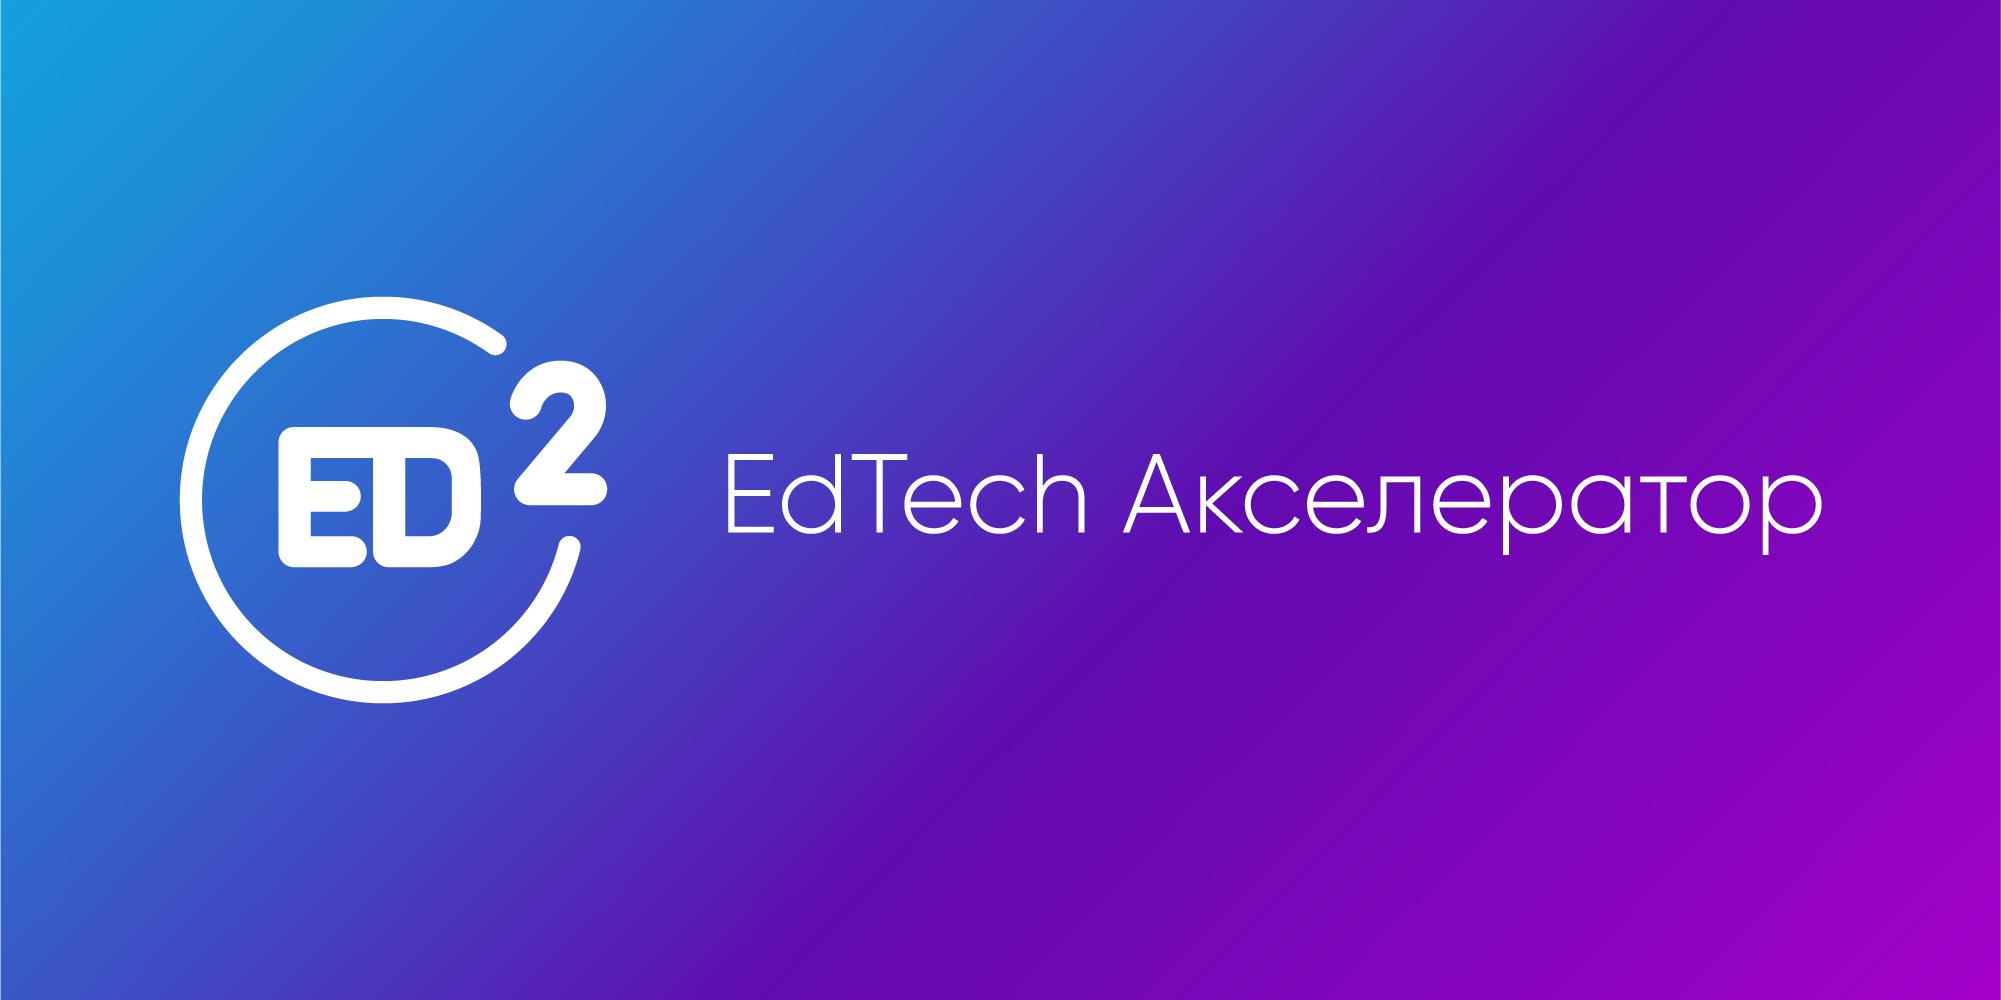 Итоги четвертого набора EdTech Акселератора ED2